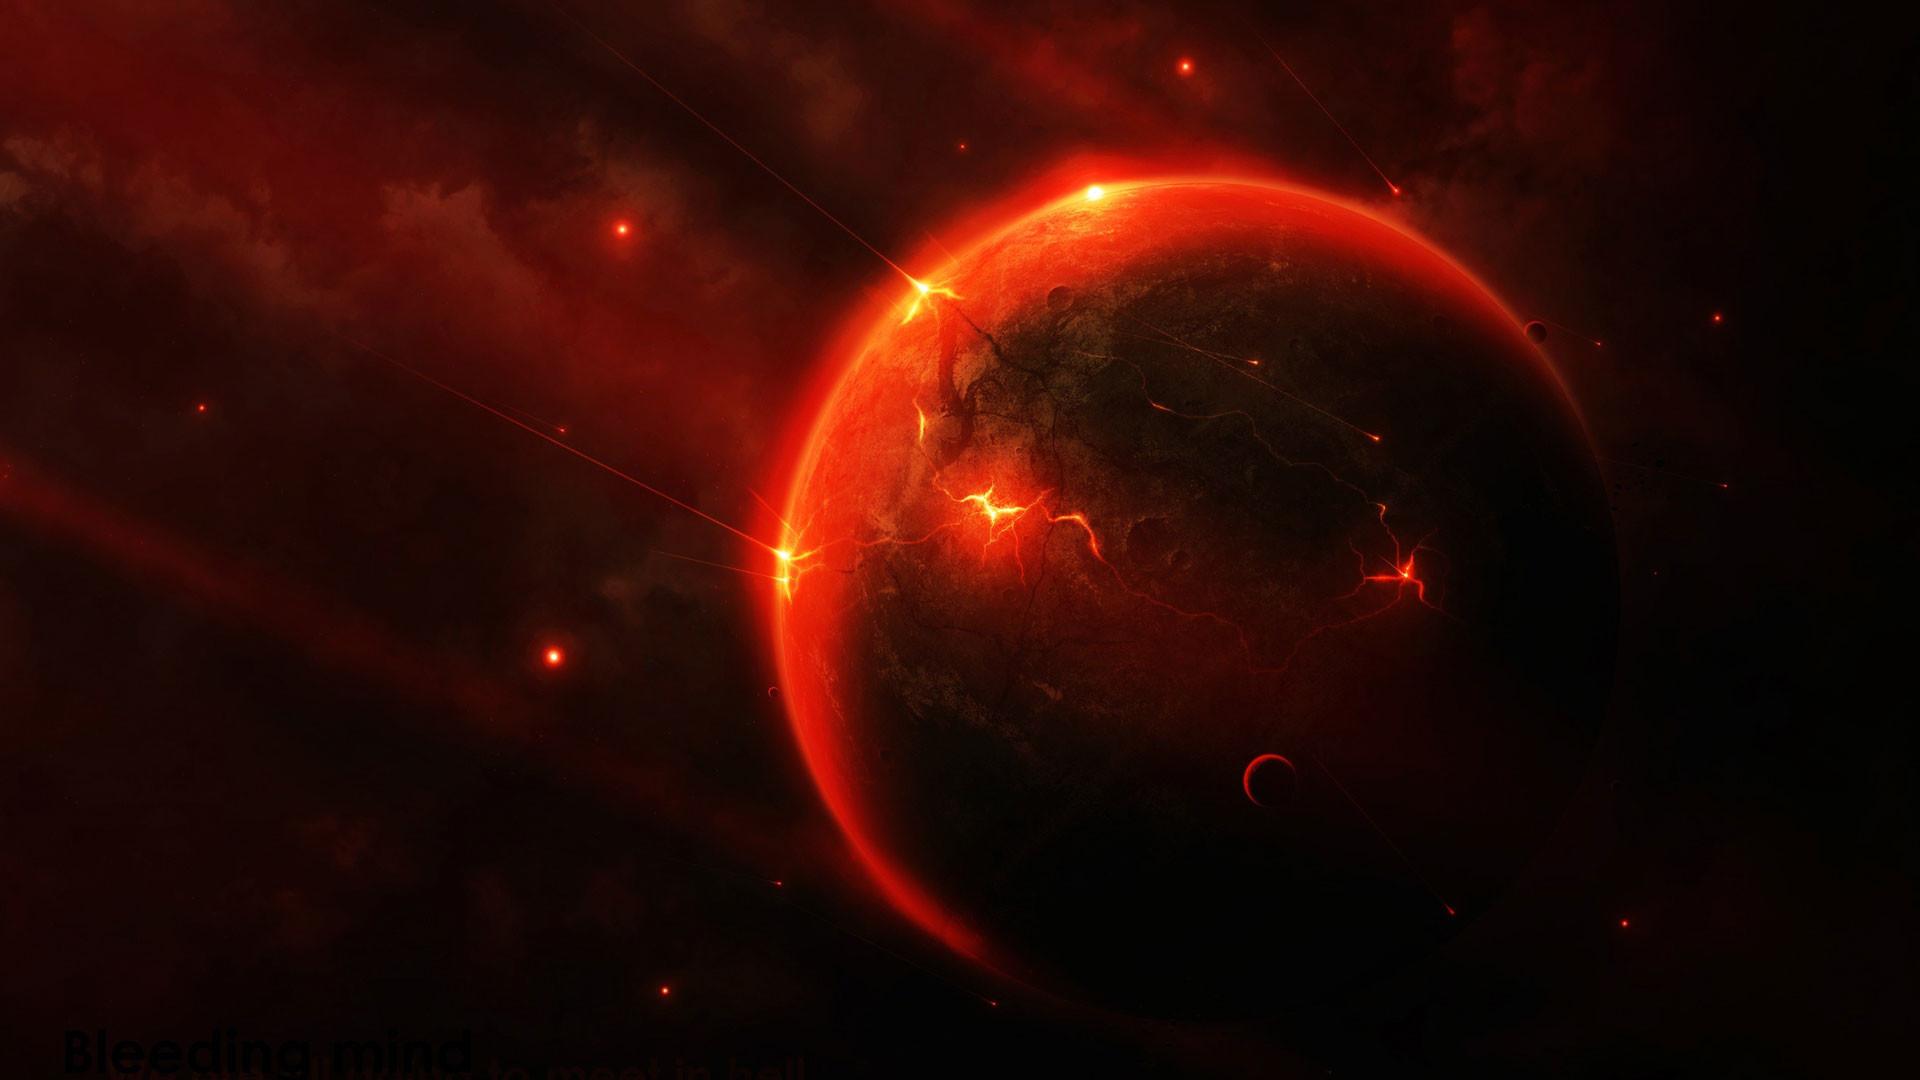 hd pics photos red space planet black desktop background wallpaper